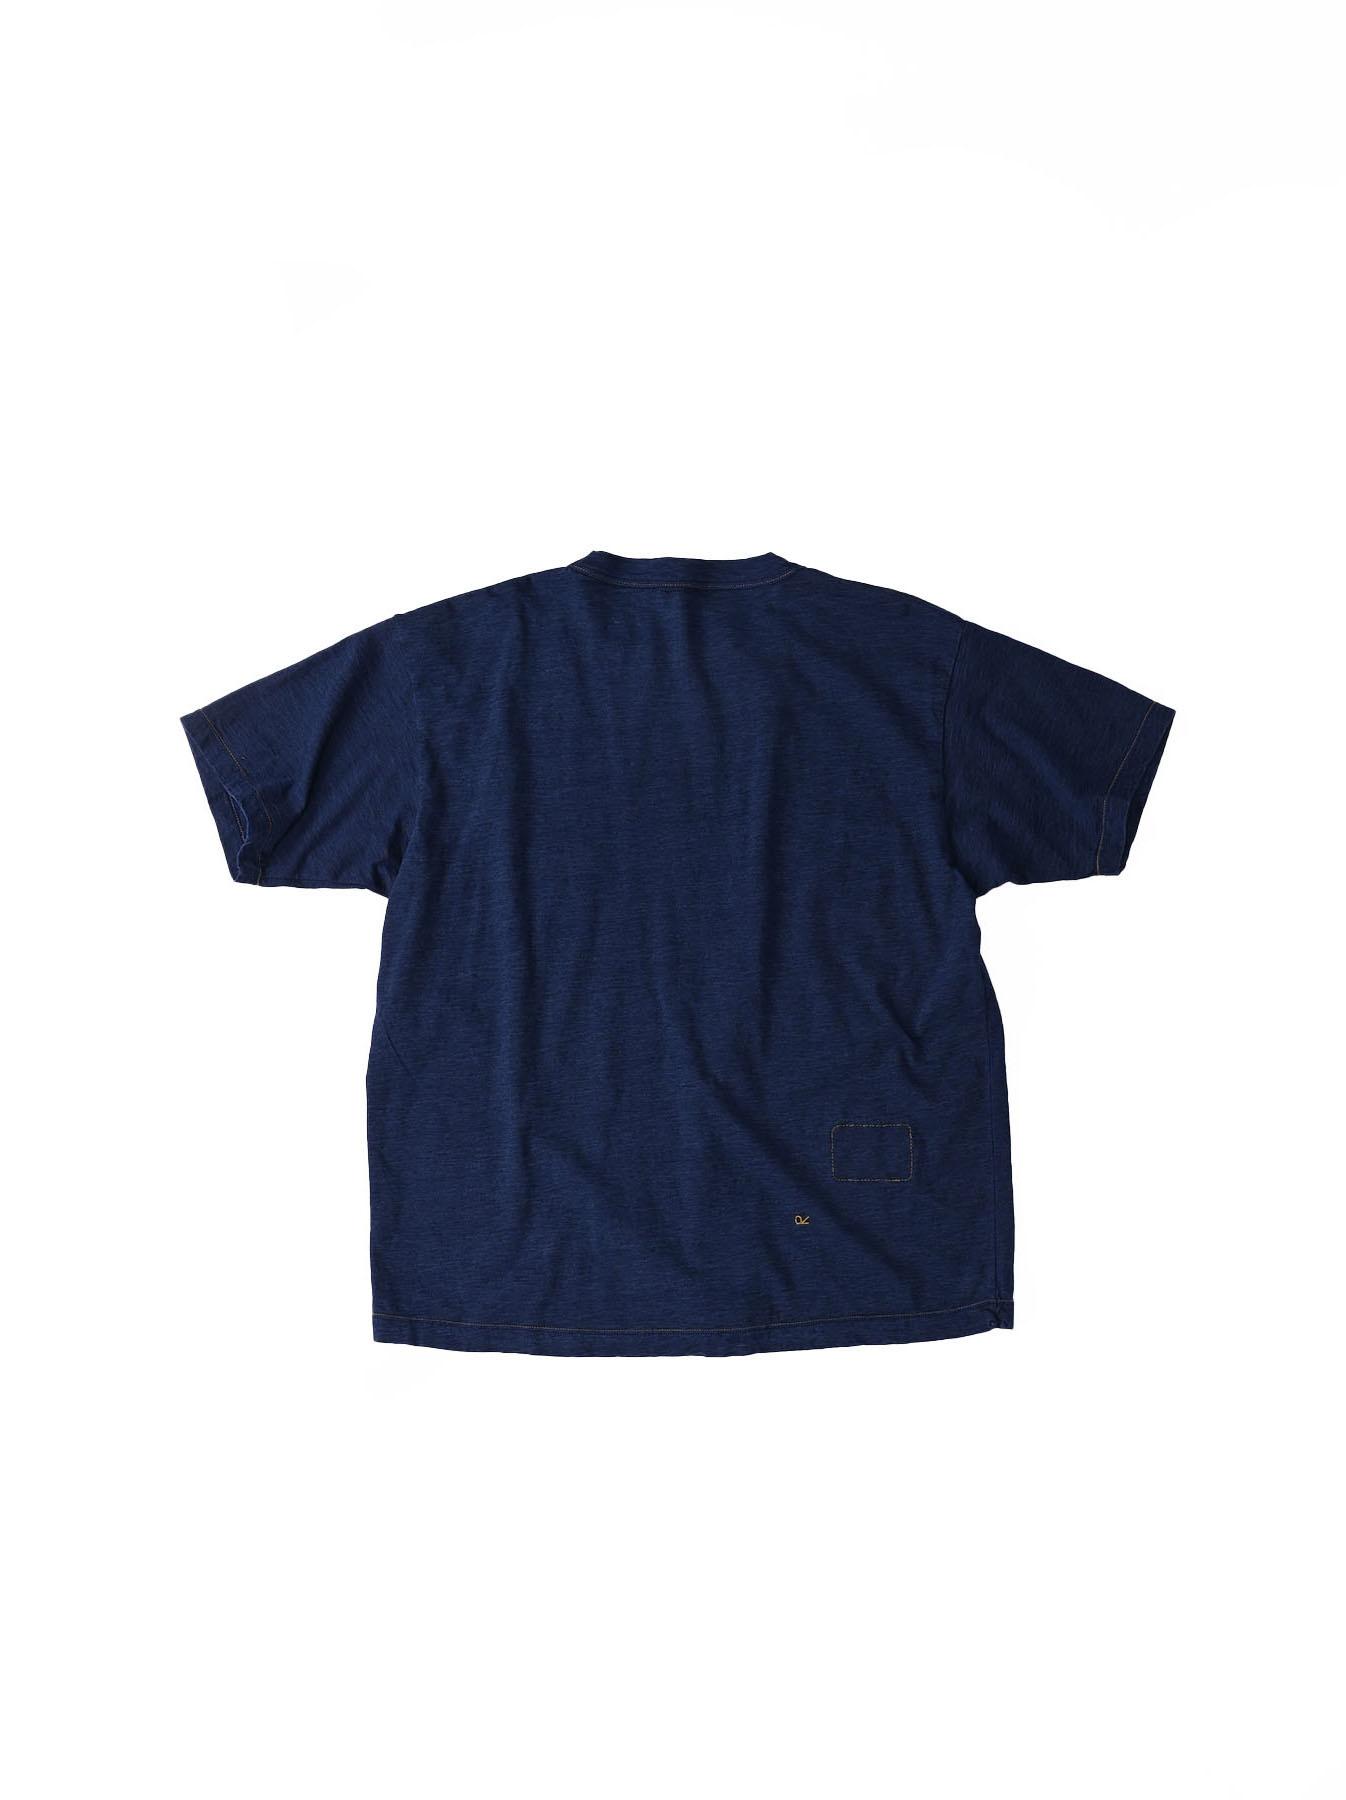 One Wash Indigo Tenjiku 908 Ocean T-Shirt (0621)-6